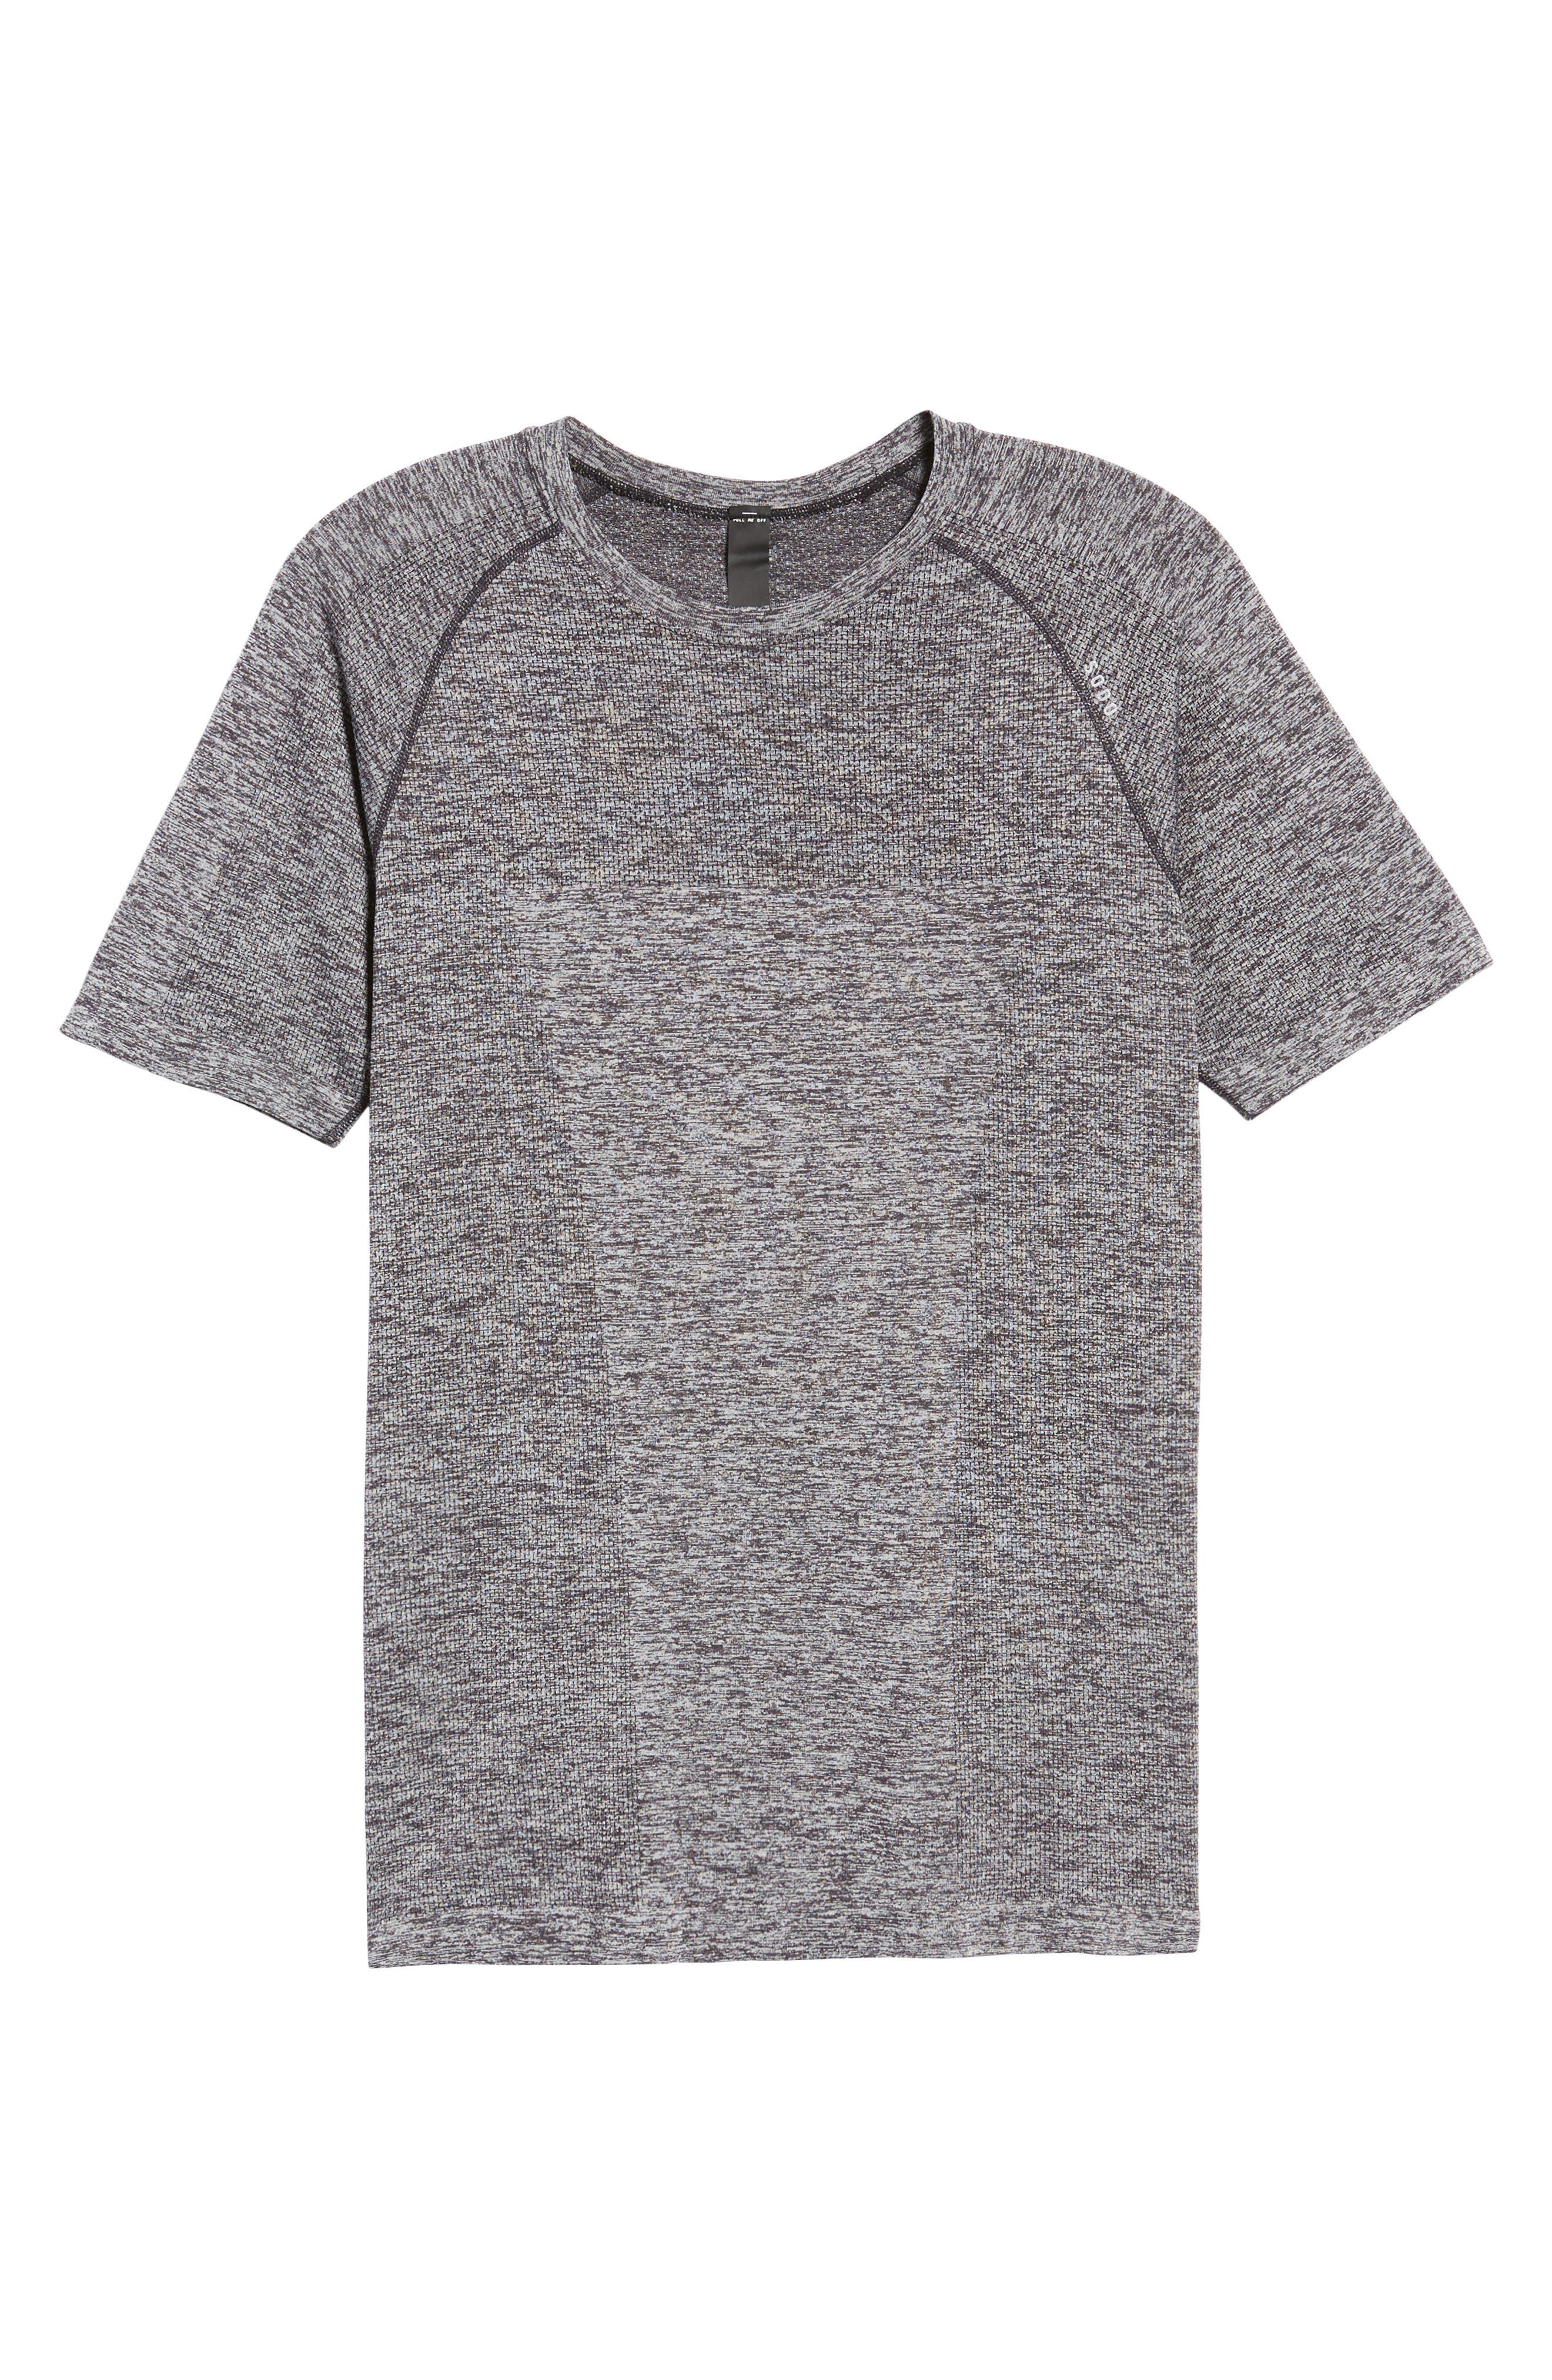 Seamless Crewneck Performance T-Shirt,                             Alternate thumbnail 6, color,                             Heather Black/ Black